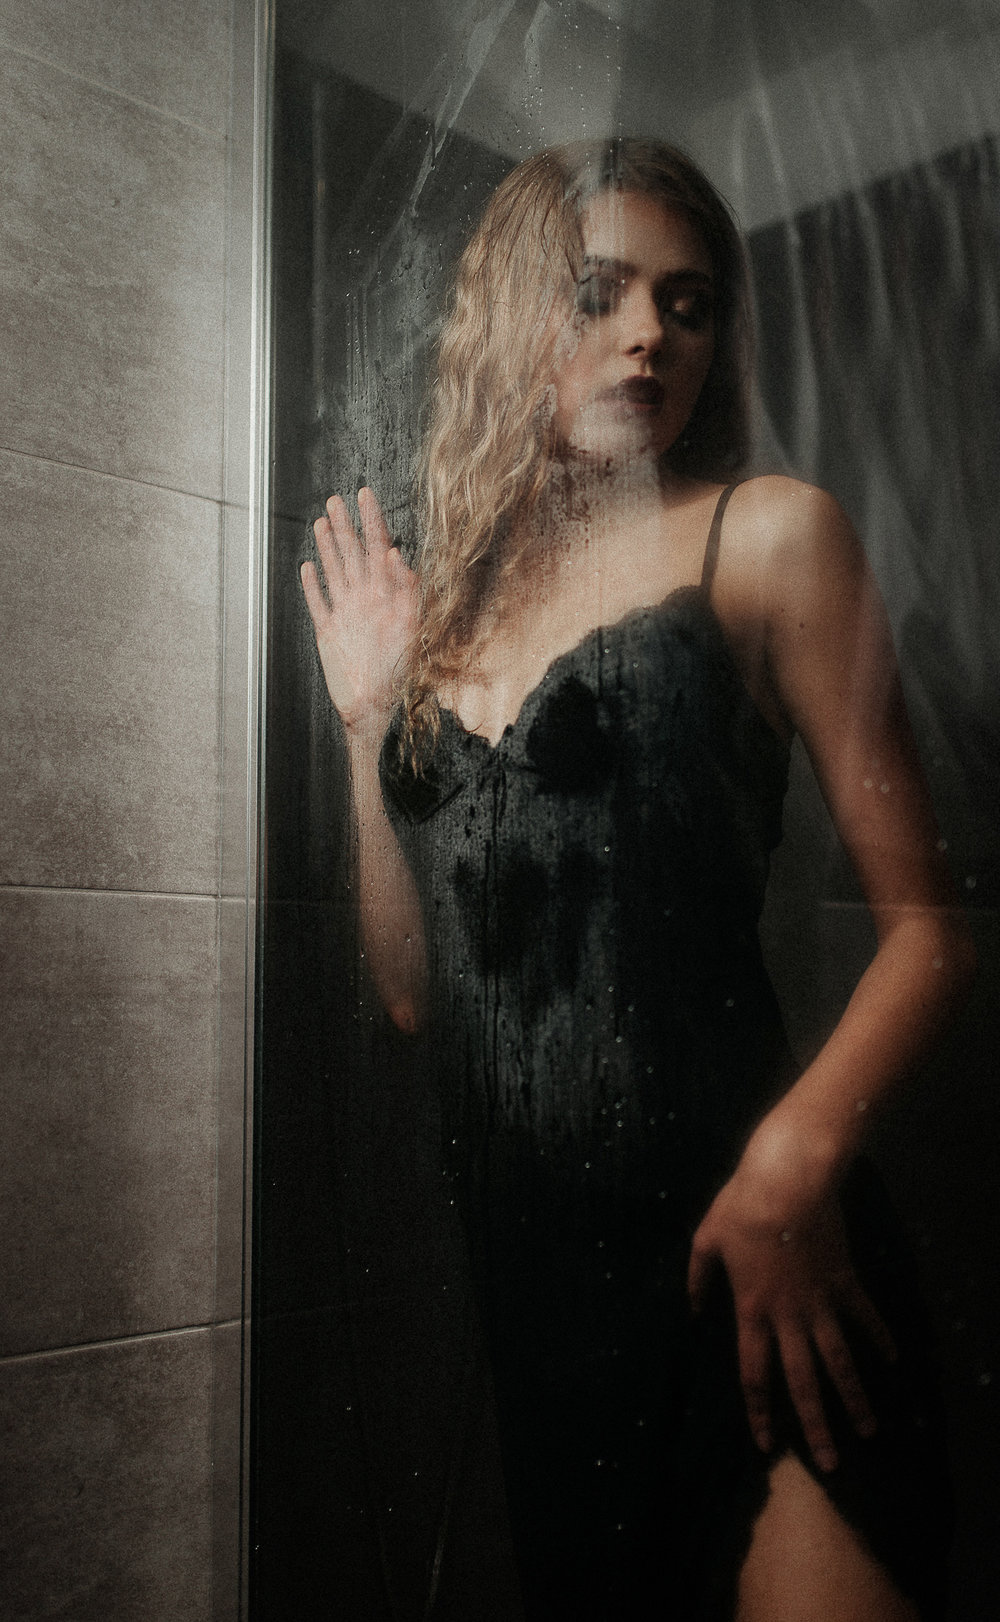 sensual-shower.jpg